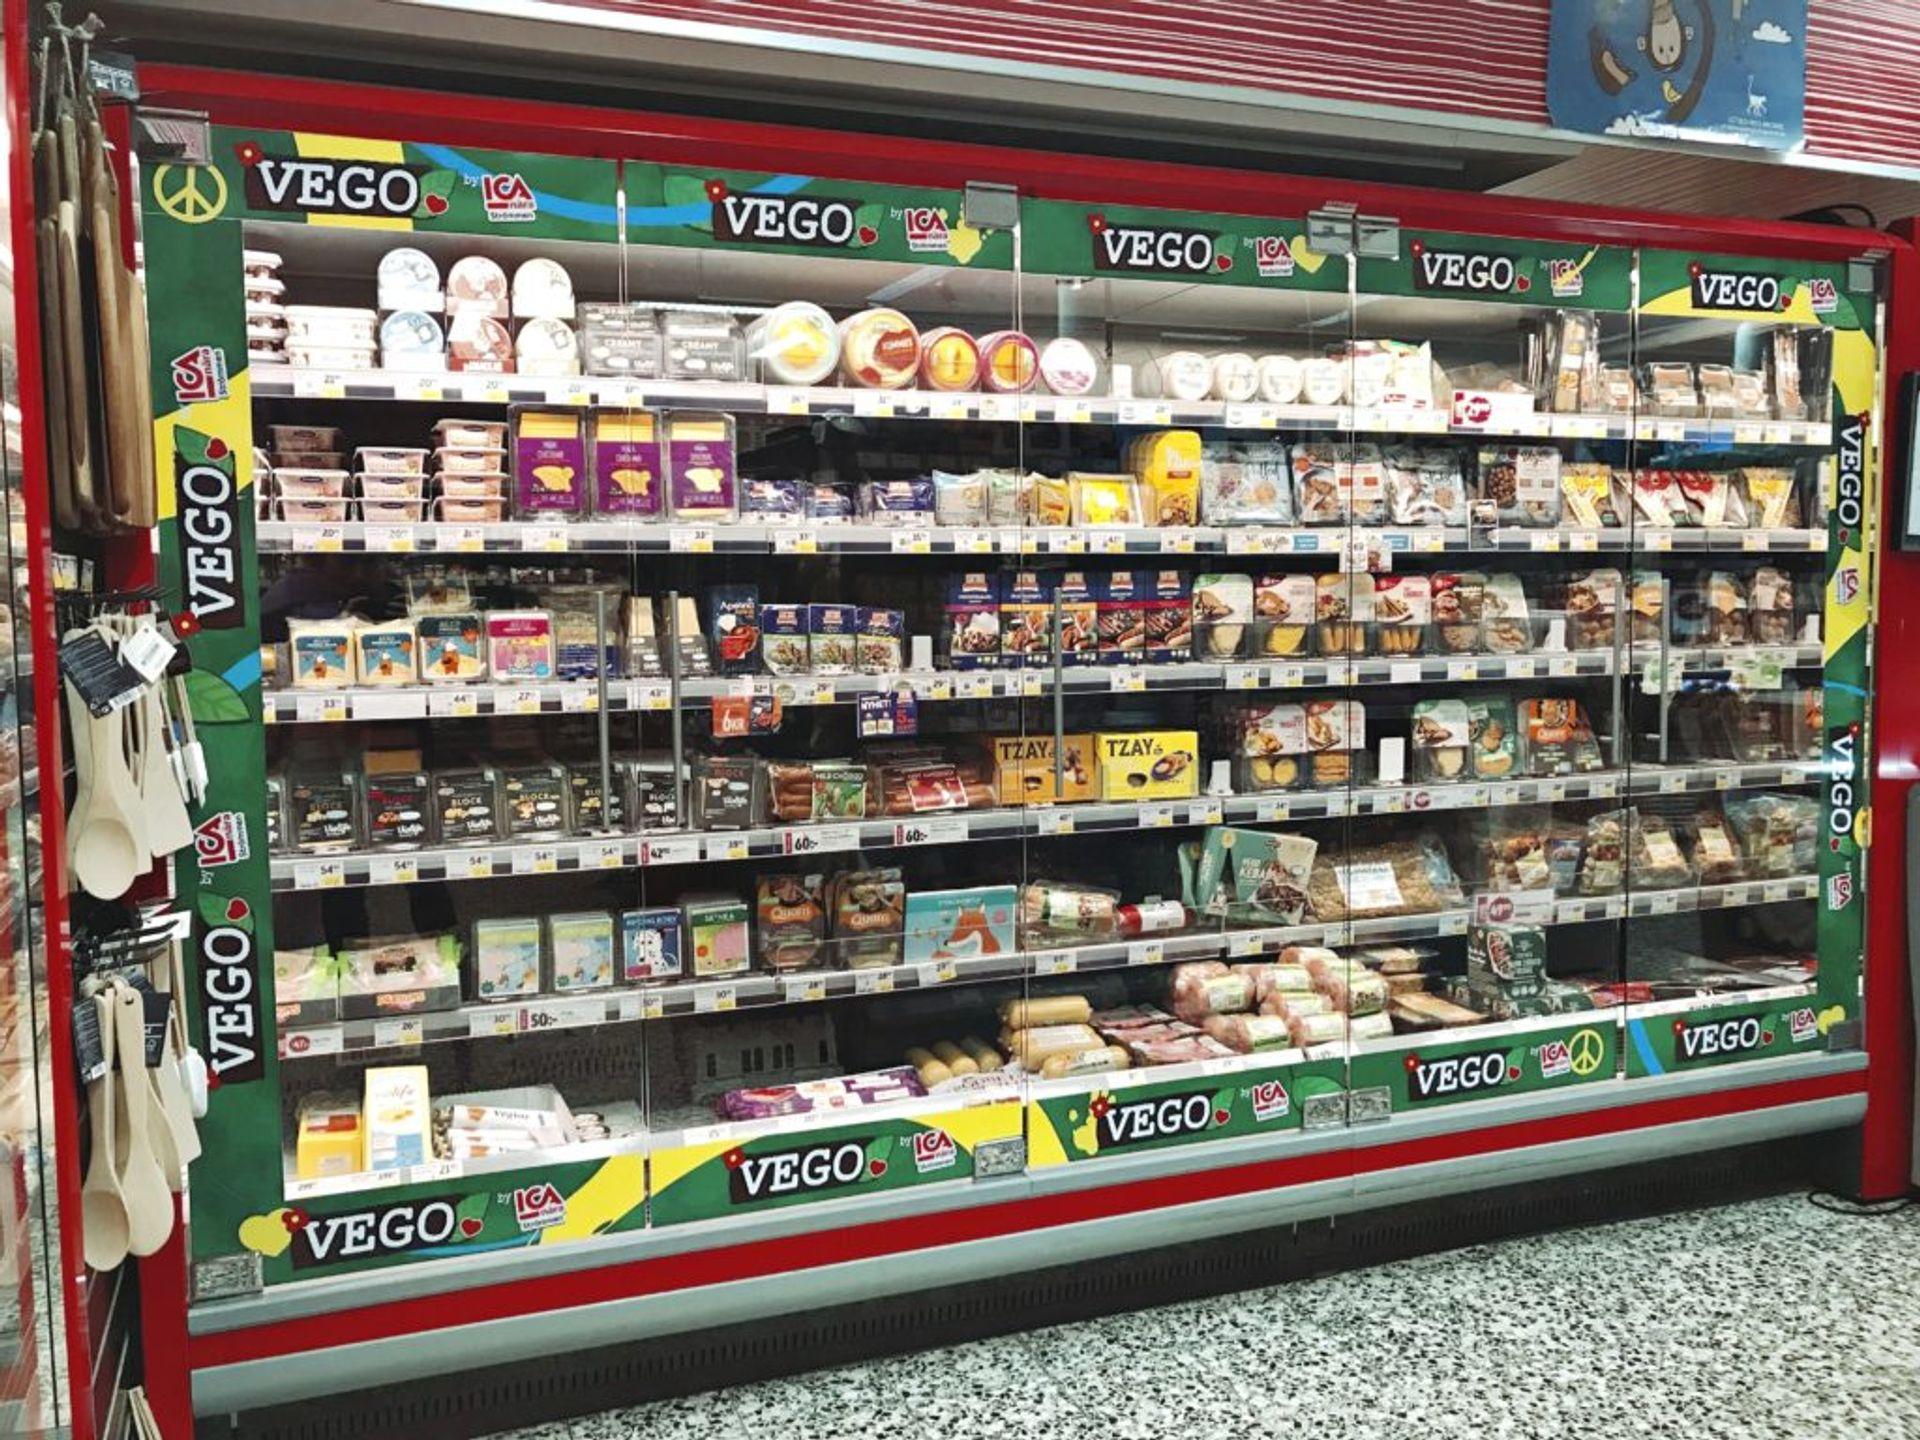 Shelves of frozen vegetarian food in a supermarket.